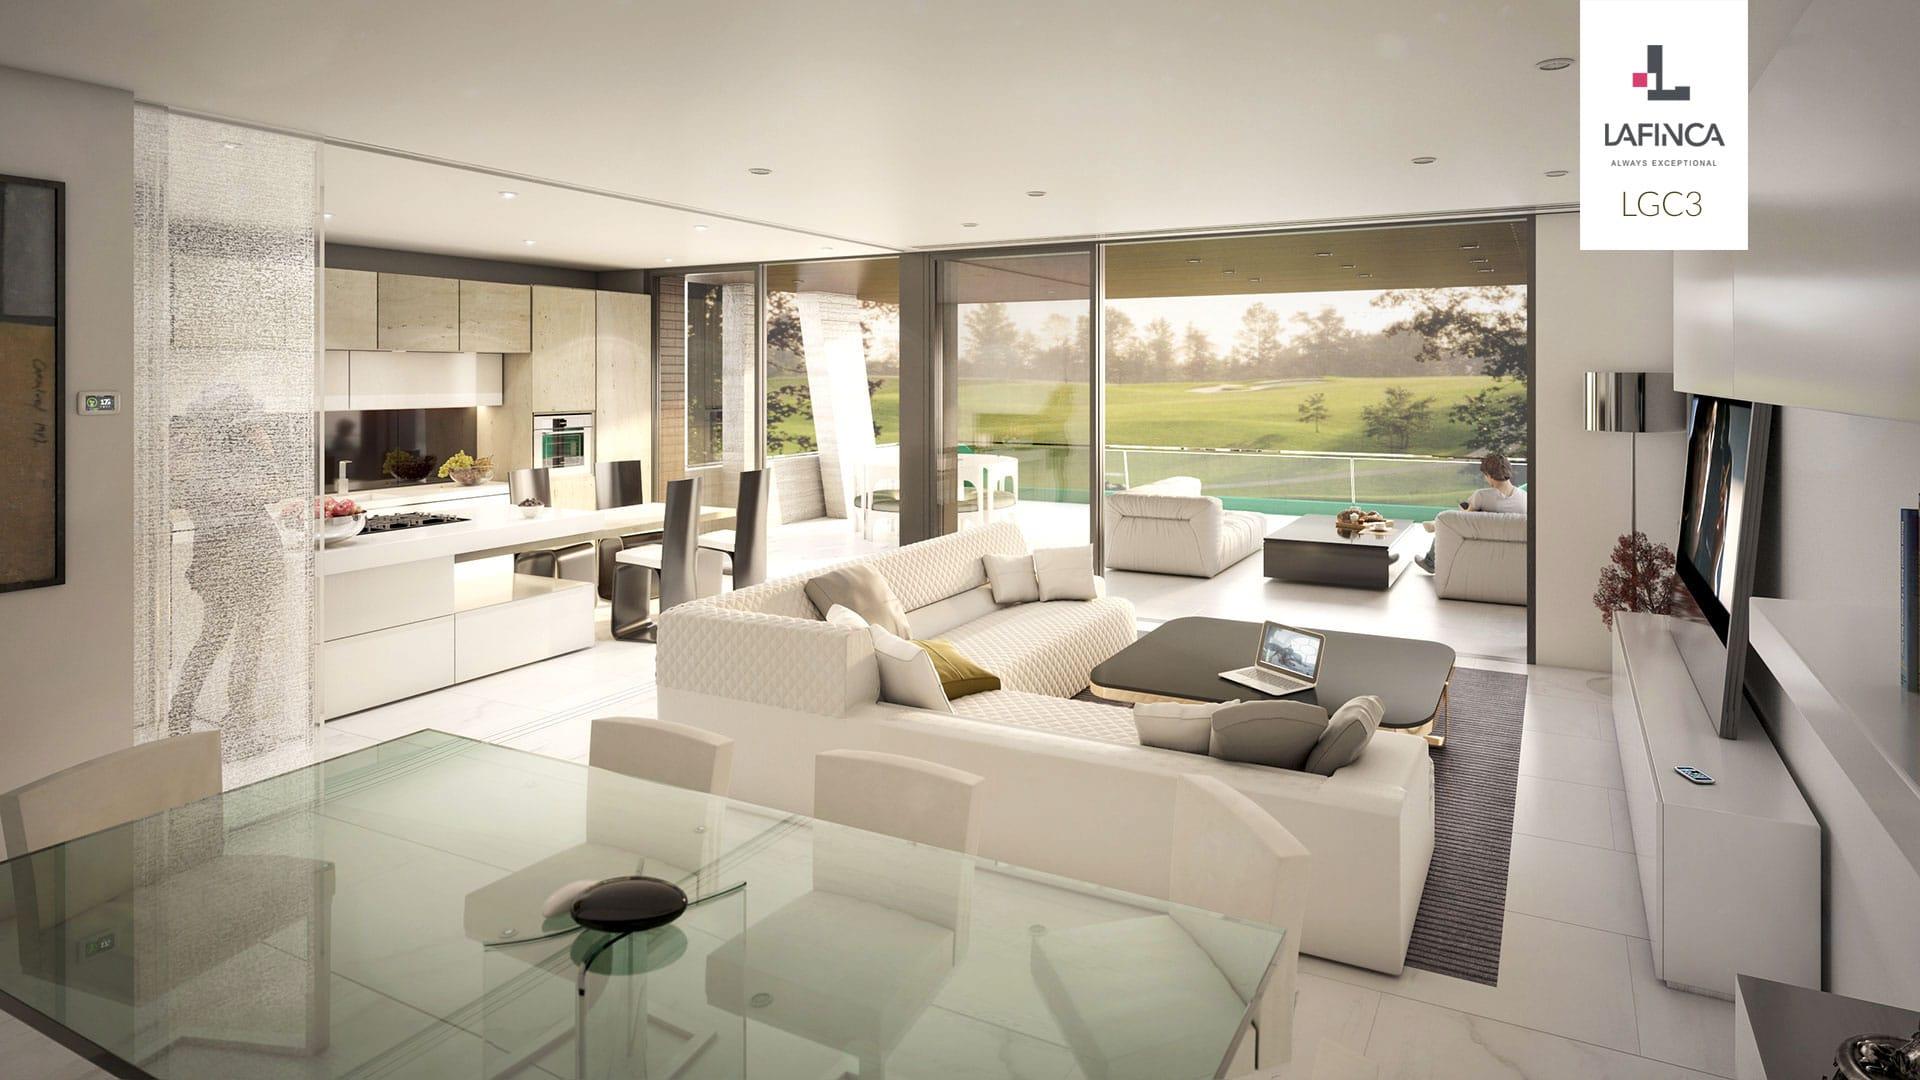 LAFINCA Residencial LGC3 - Salón